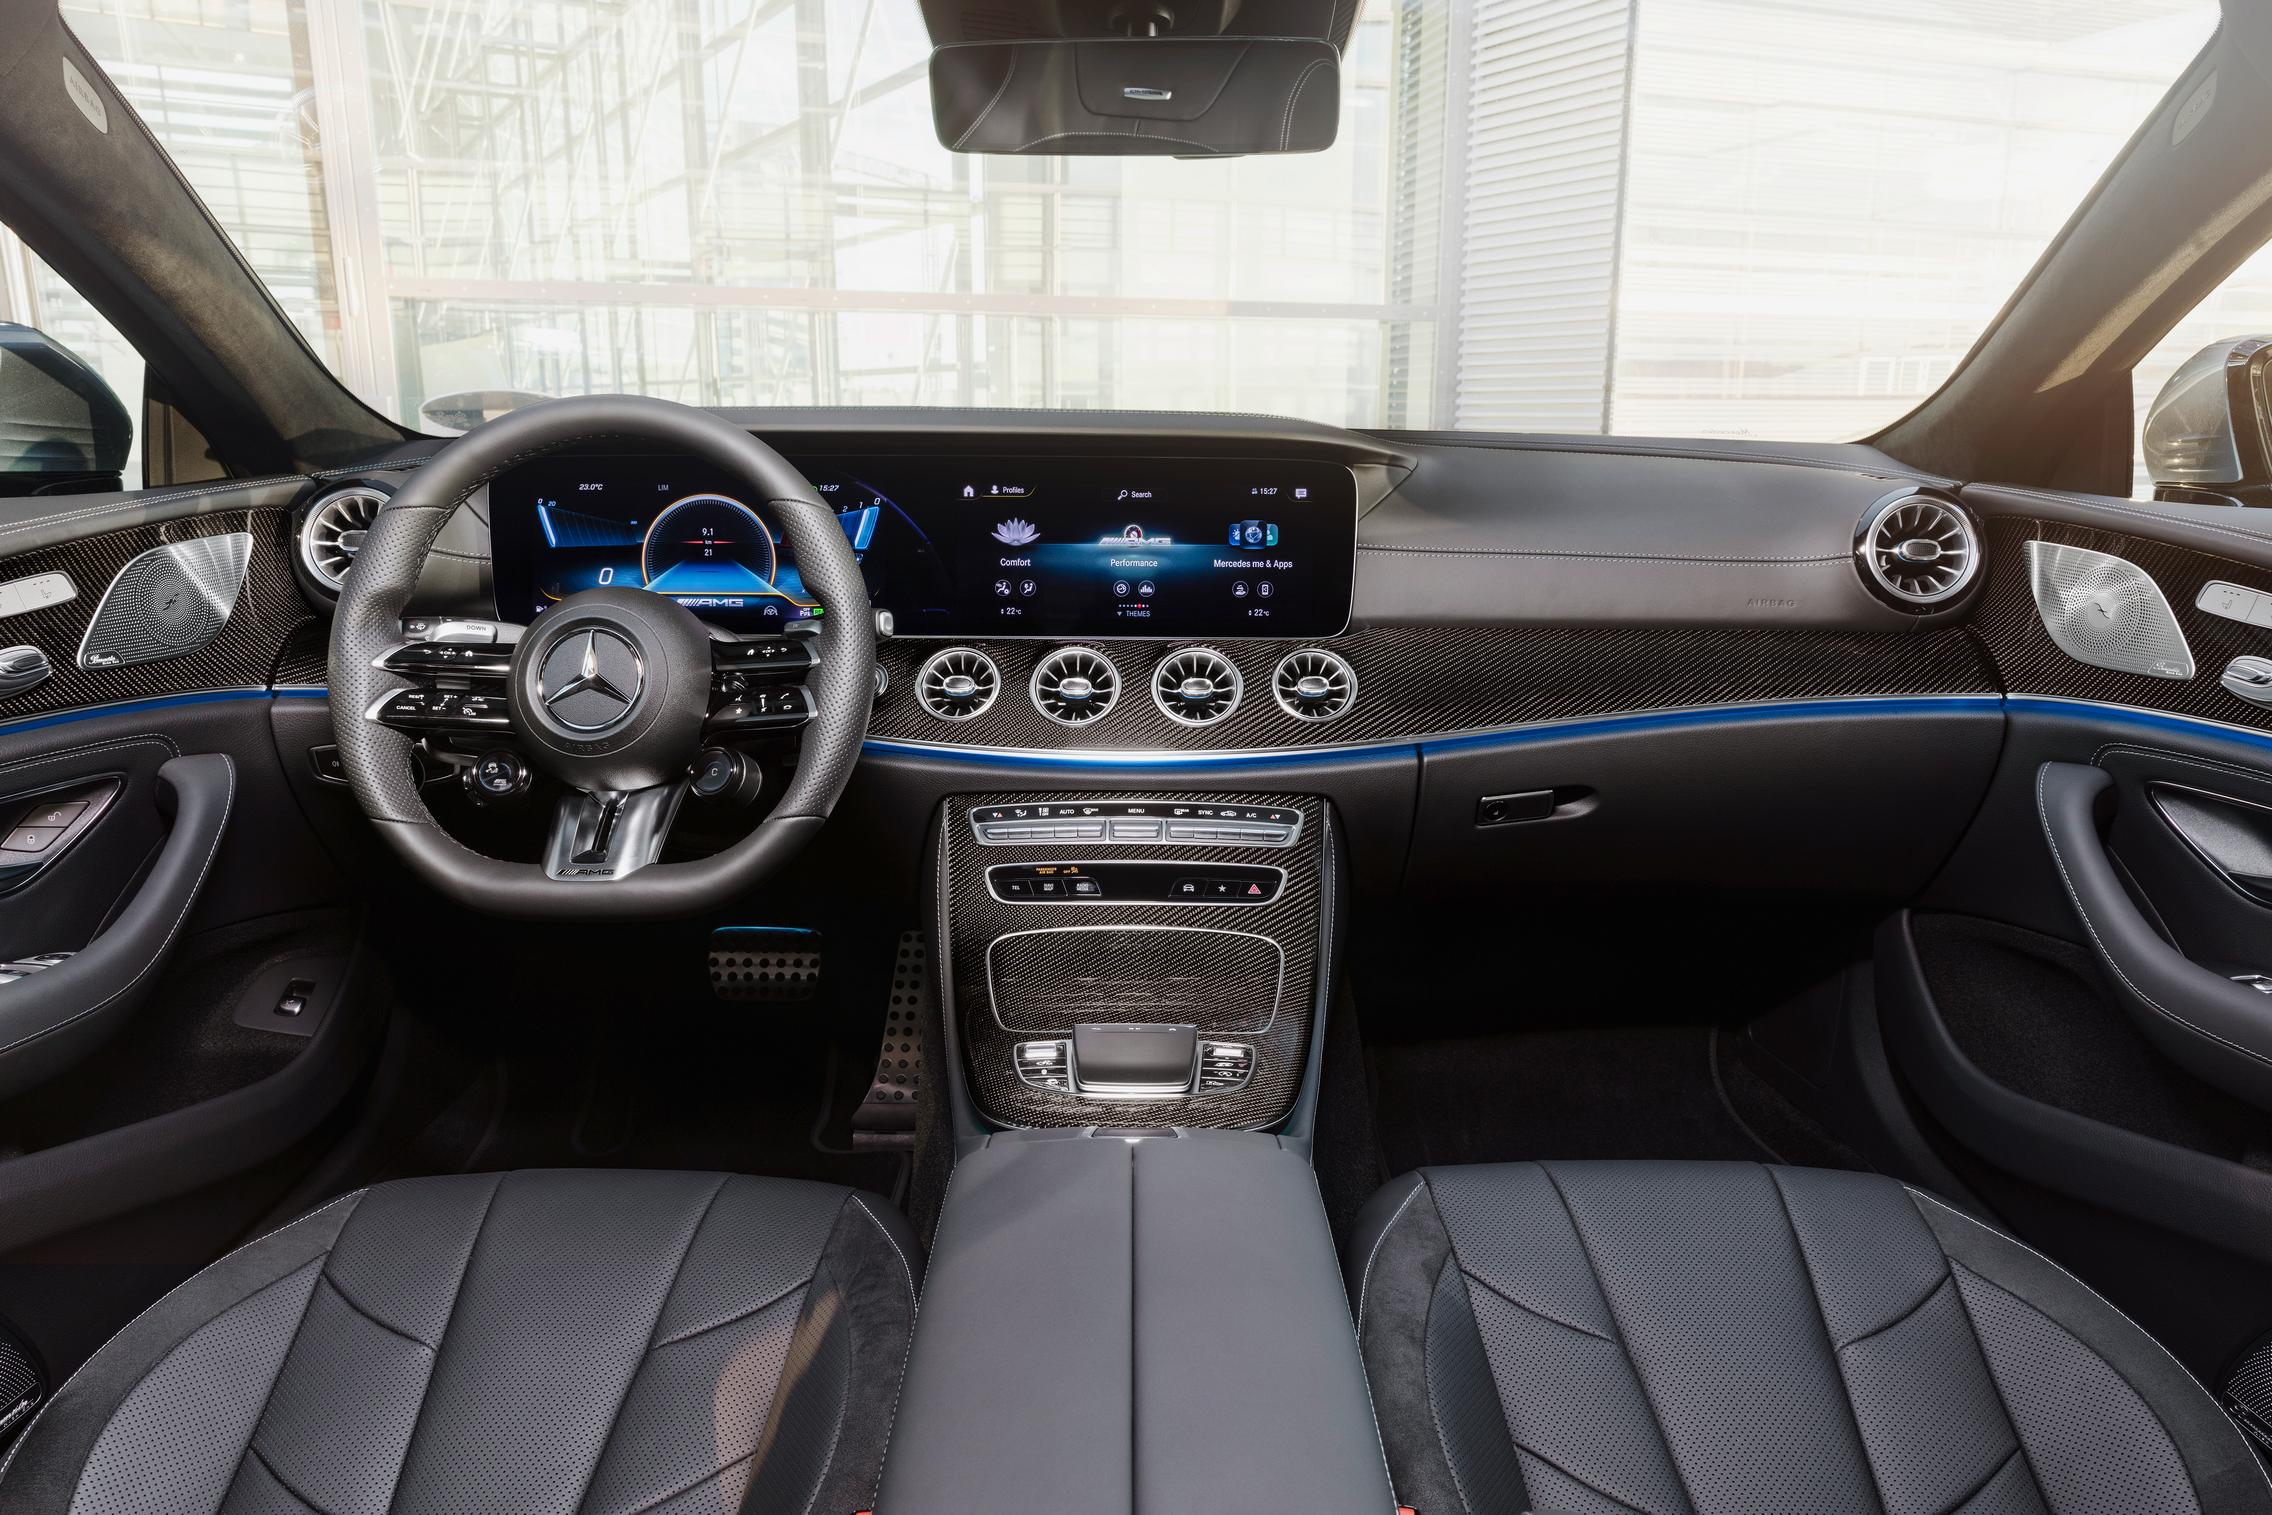 2022 Mercedes-AMG CLS 53 interior